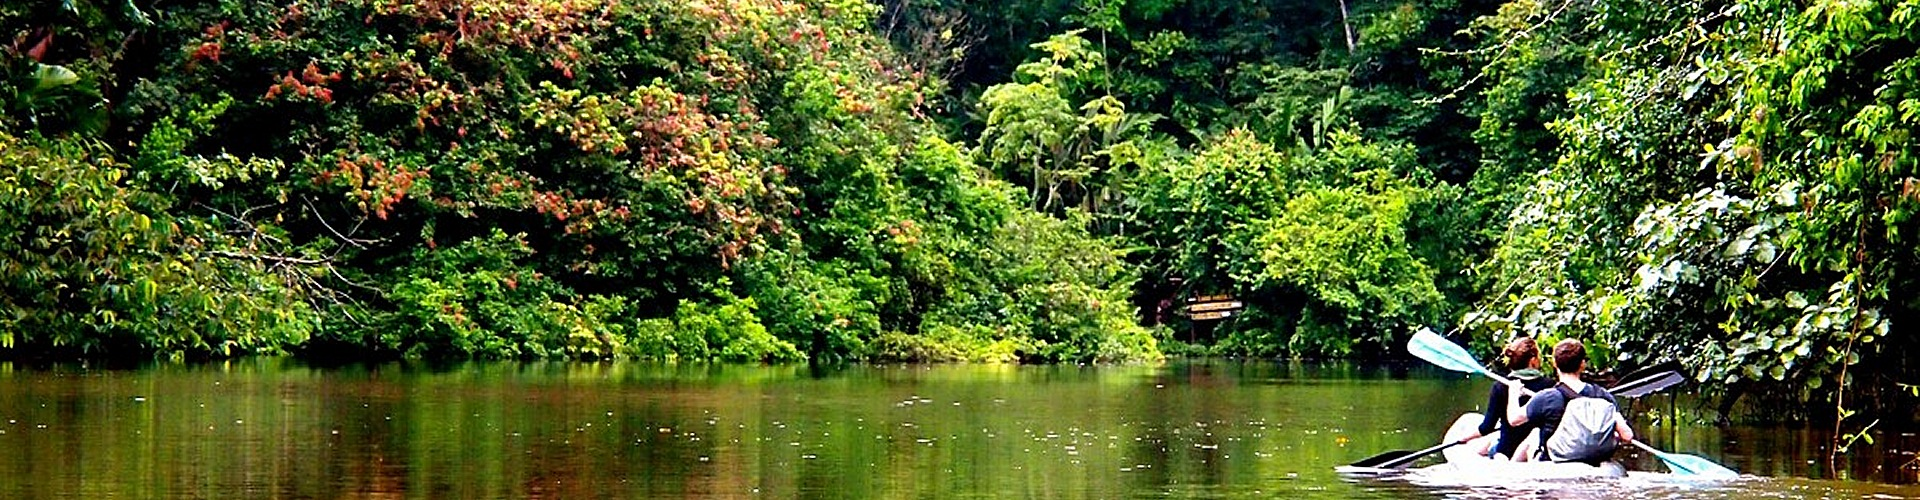 Das pure Leben entdecken im Tortuguero Nationalpark in Costa Rica